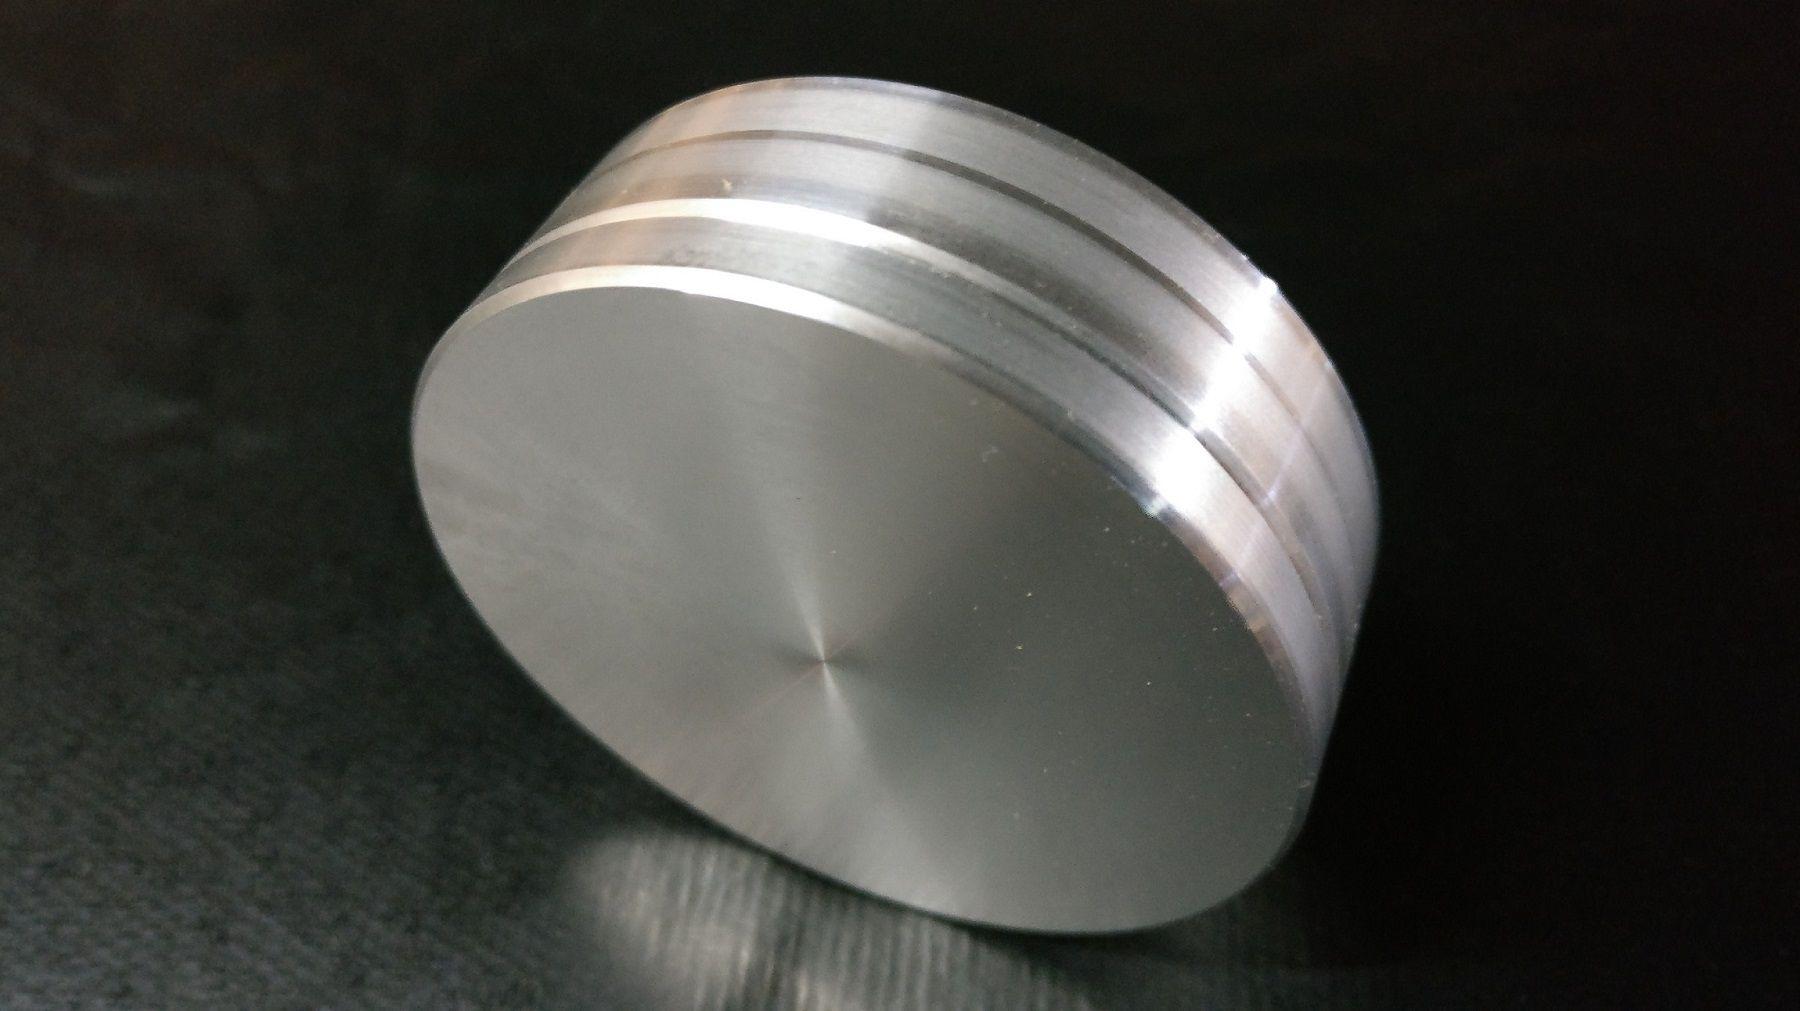 Kit 4 Peça Base de Prato Giratória Alumínio 7 cm diâmetro